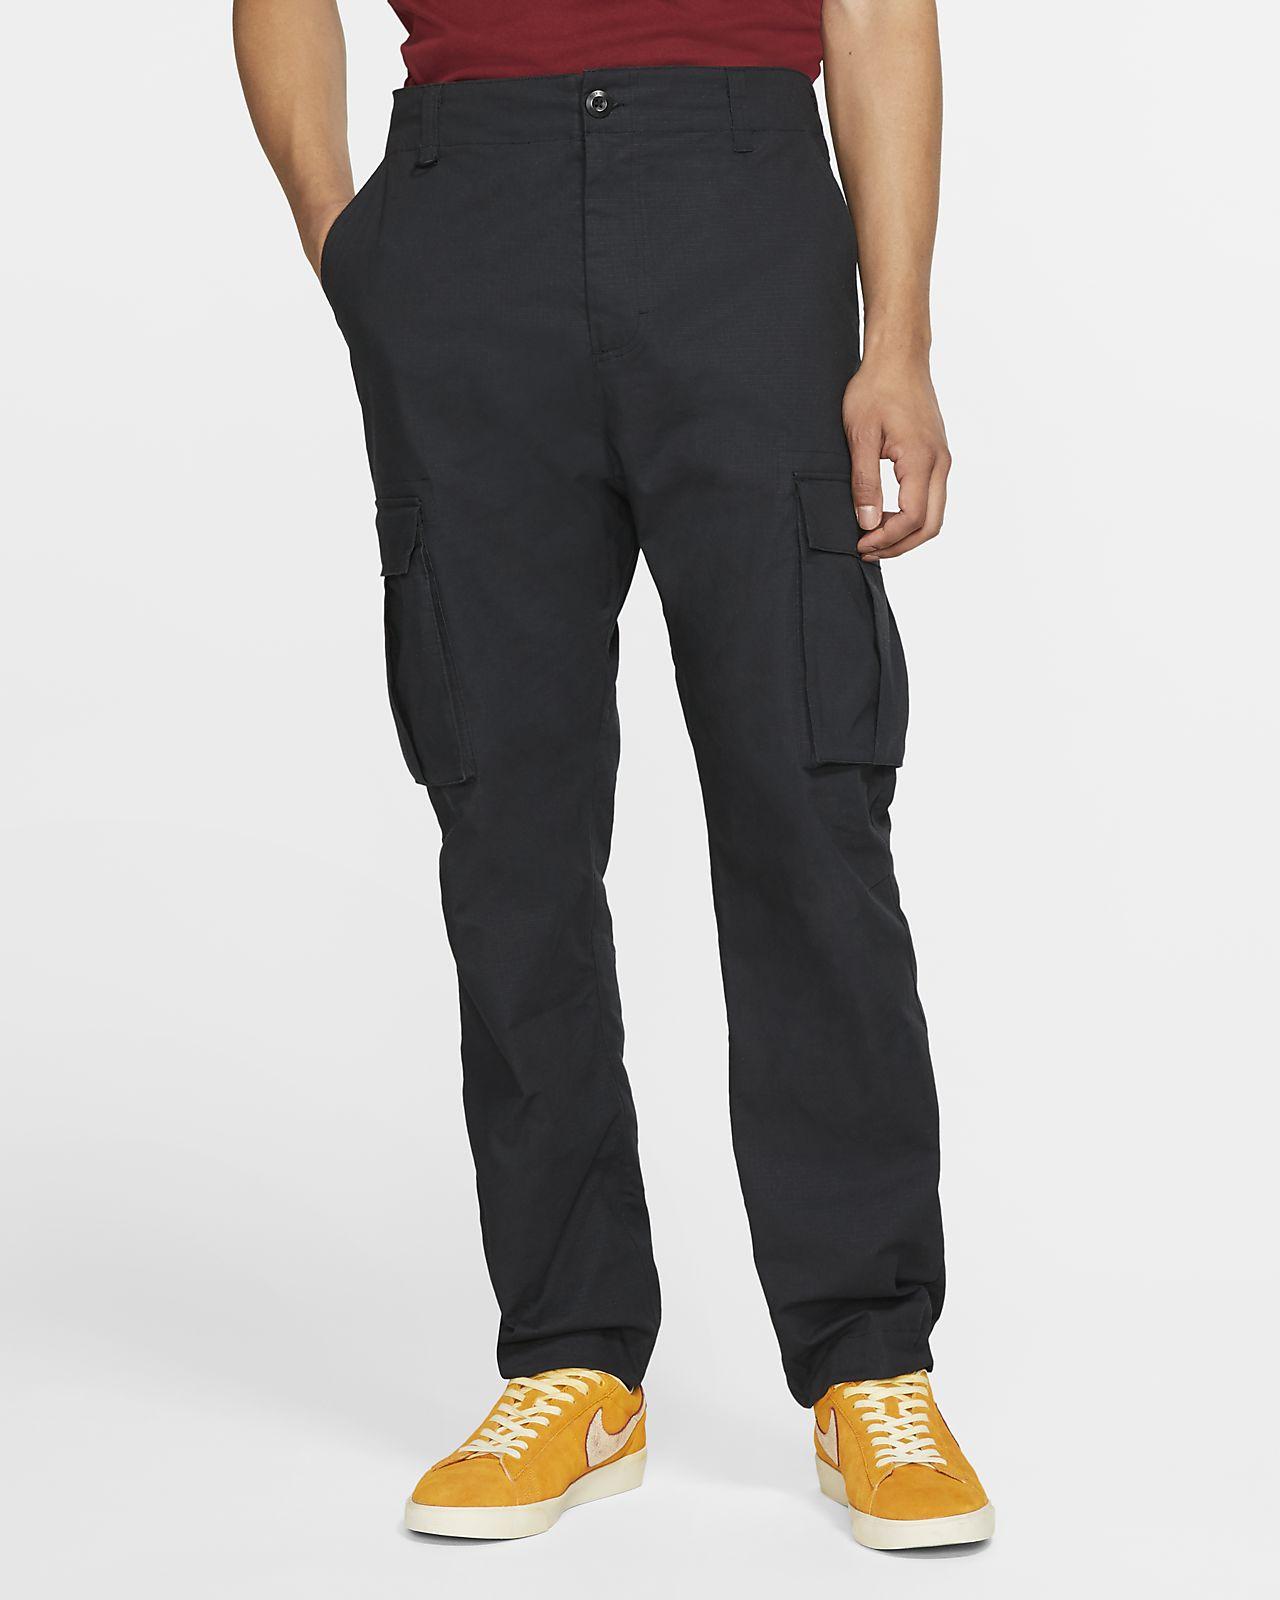 Nike SB Flex FTM Erkek Kaykay Pantolonu